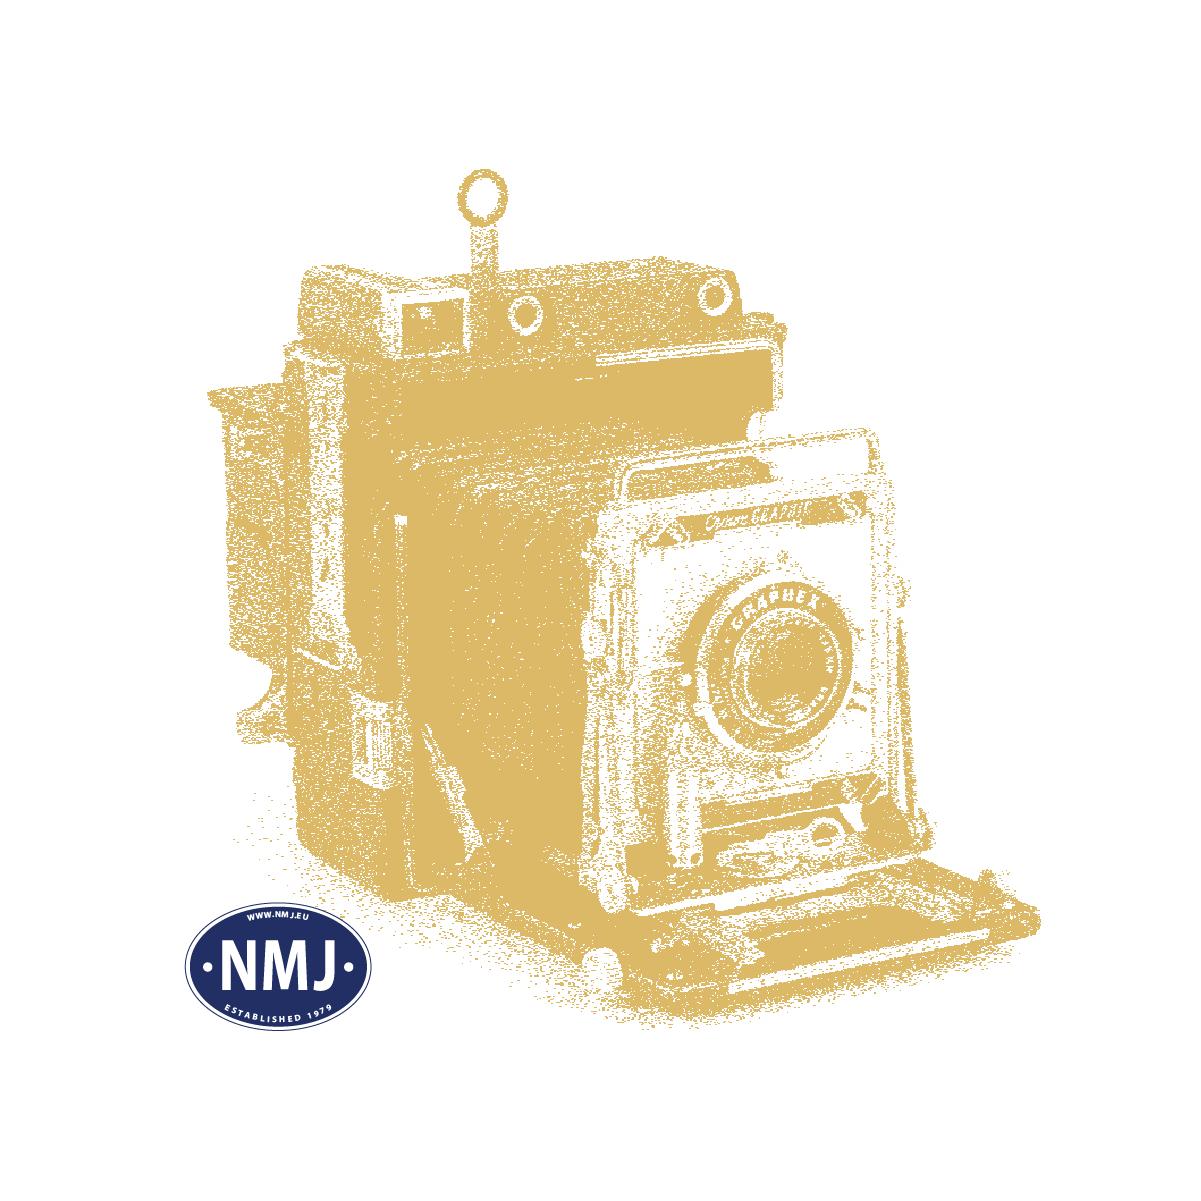 Topline Lokomotiver, nmj-topline-145004-nsb-di3b-643-intermediate-design-0-scale-1-45-dc, NMJT145004